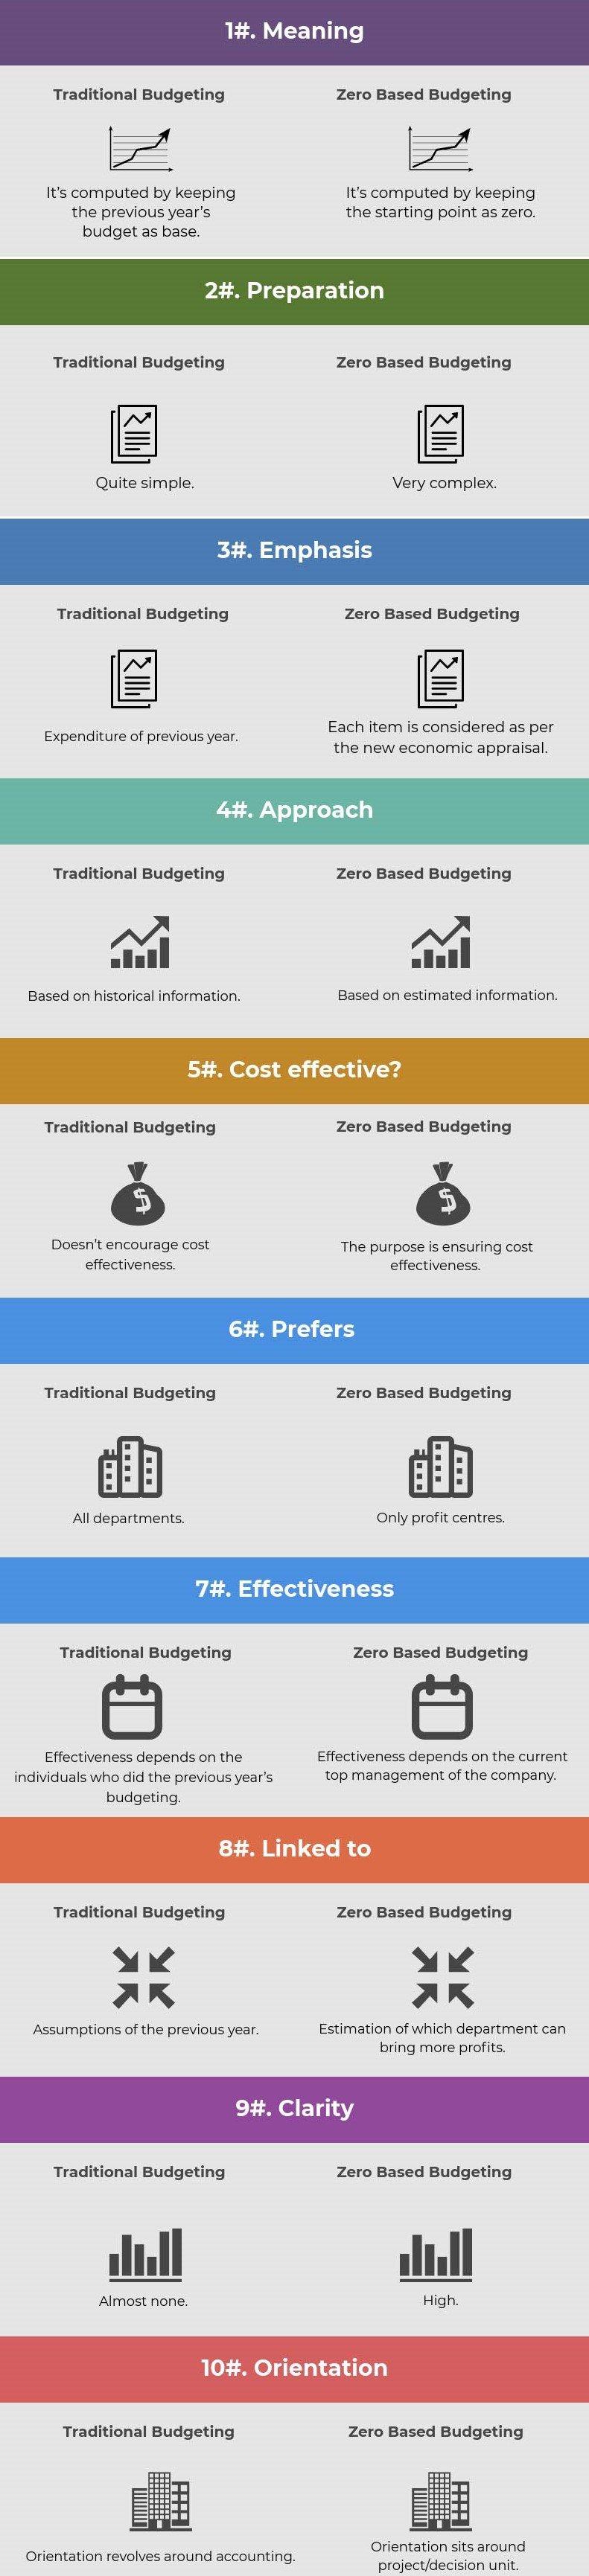 Traditional-budgeting-vs-Zero-based-budgeting